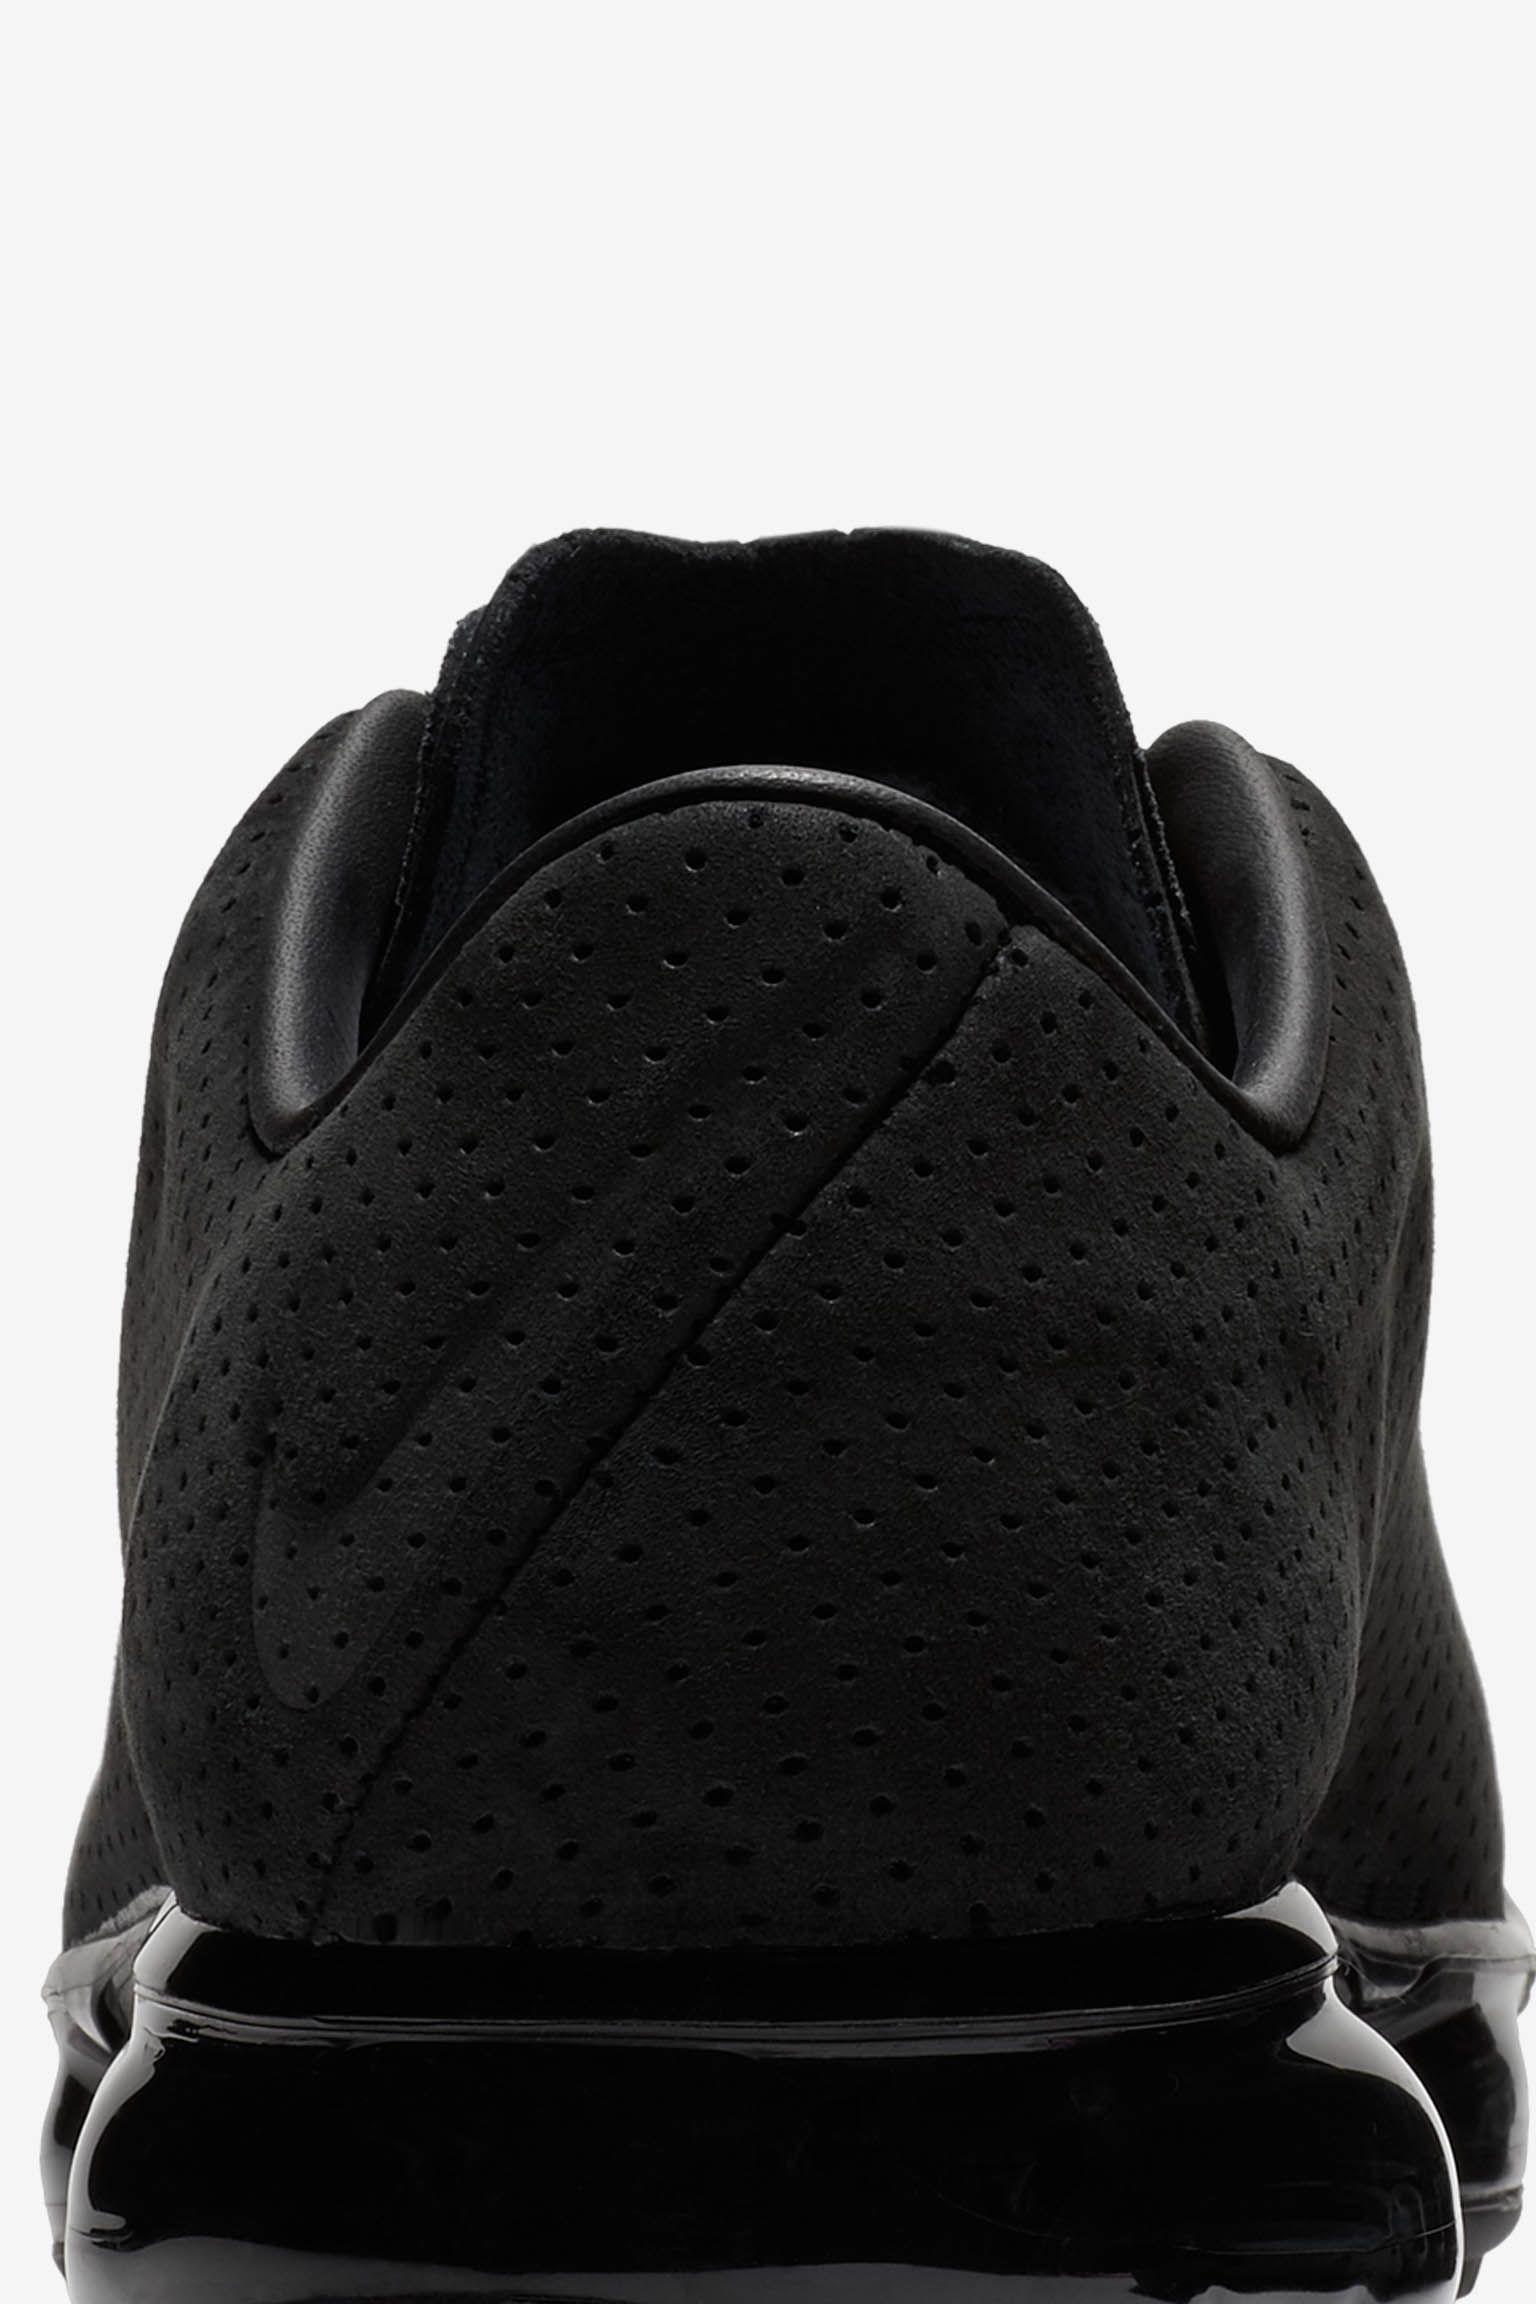 black color 07d5e 50bbb nike air vapormax oreo 2 0 release date 0ffd35004